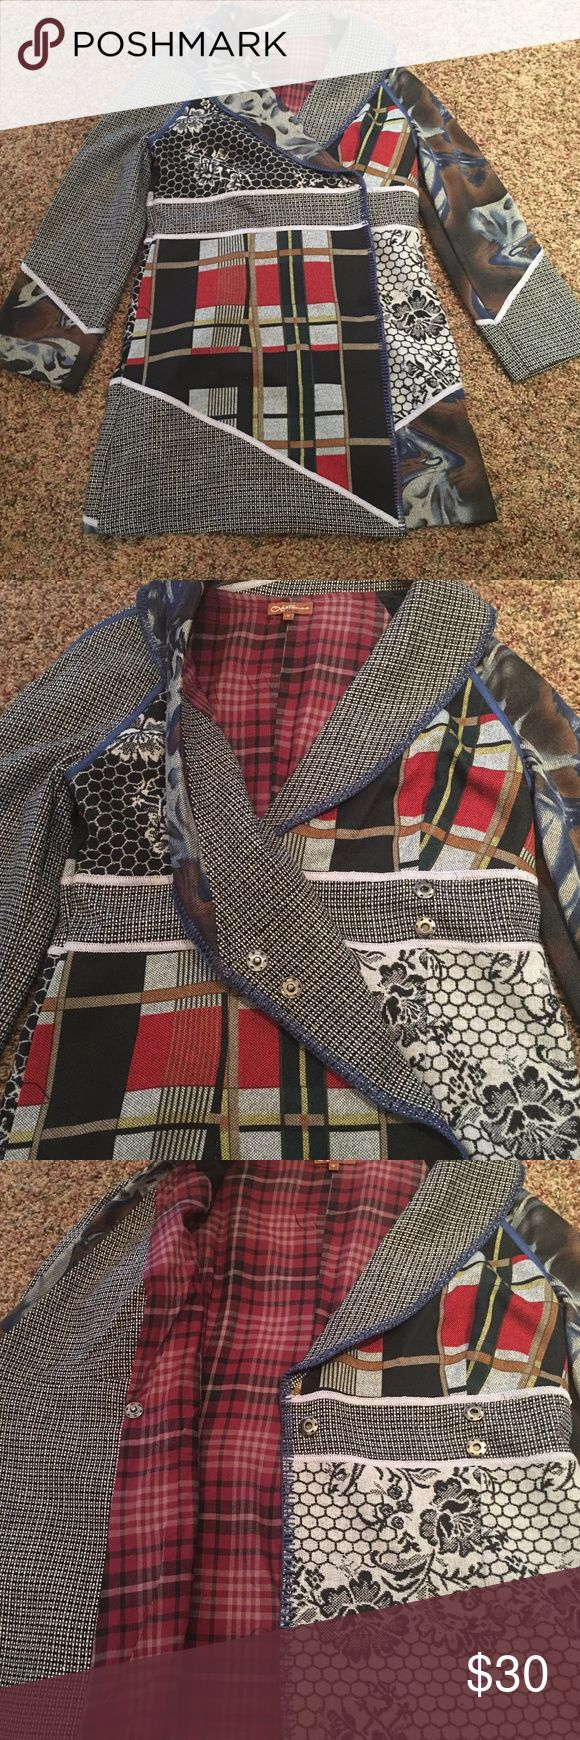 rain coat fun, multi patterned rain coat, fully lined , knee length . Cross over front  that snaps closed Ika Butoni- obstinee Jackets & Coats